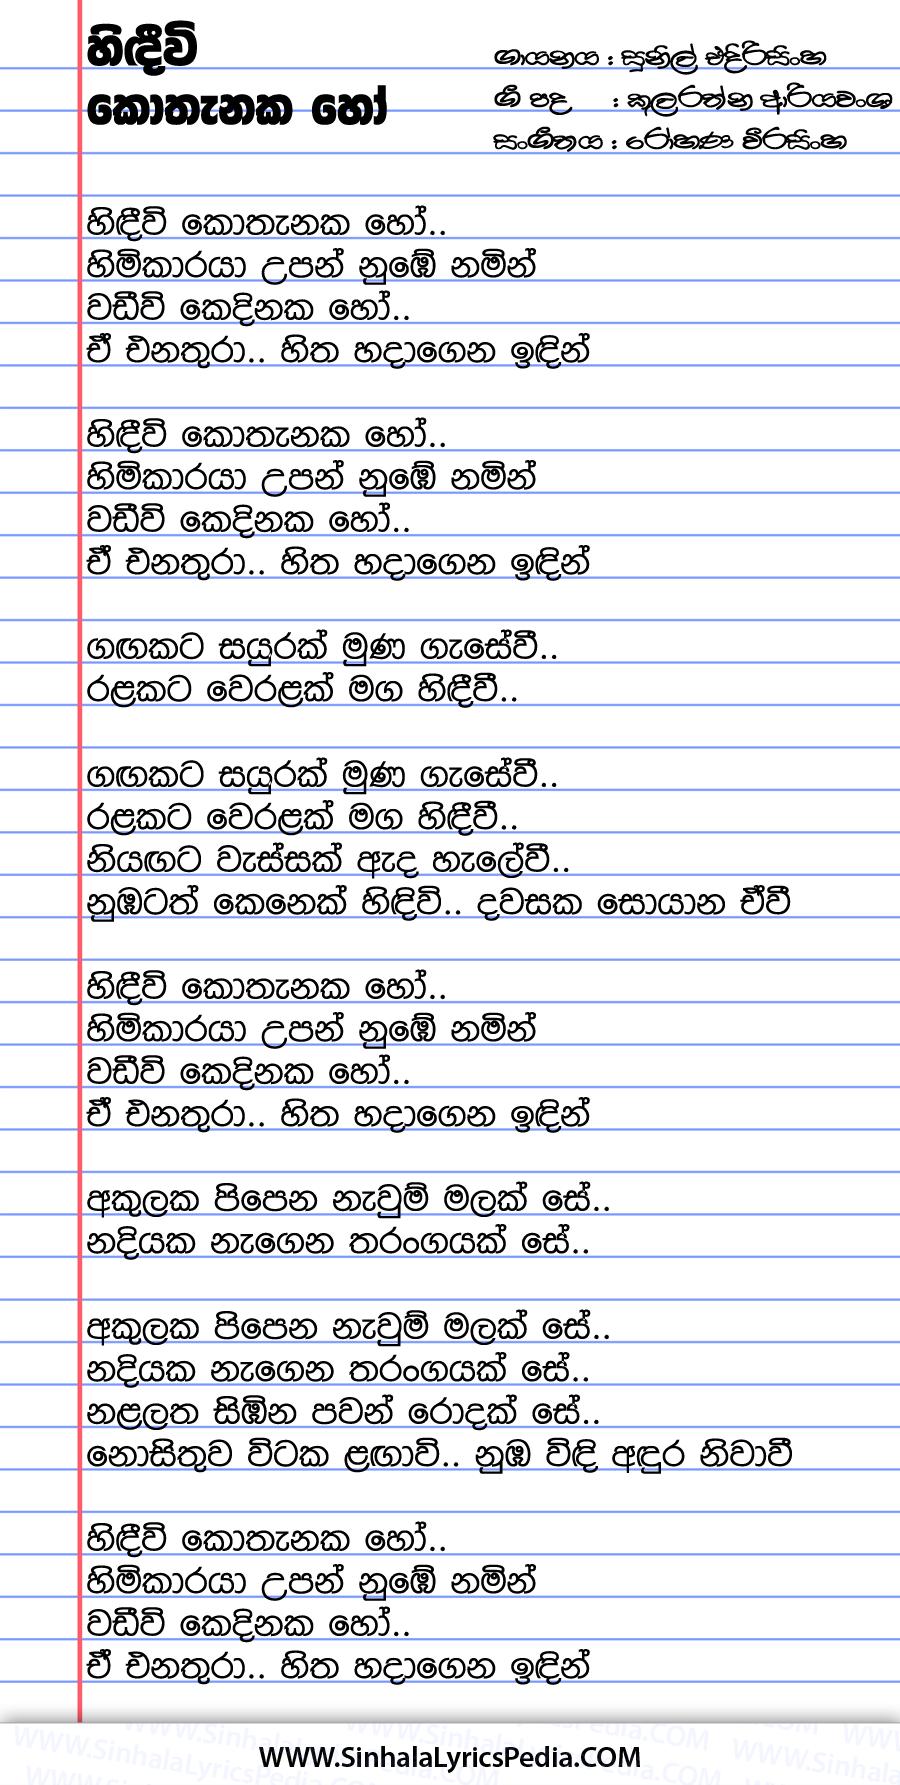 Hindiwi Kothanaka Ho Song Lyrics